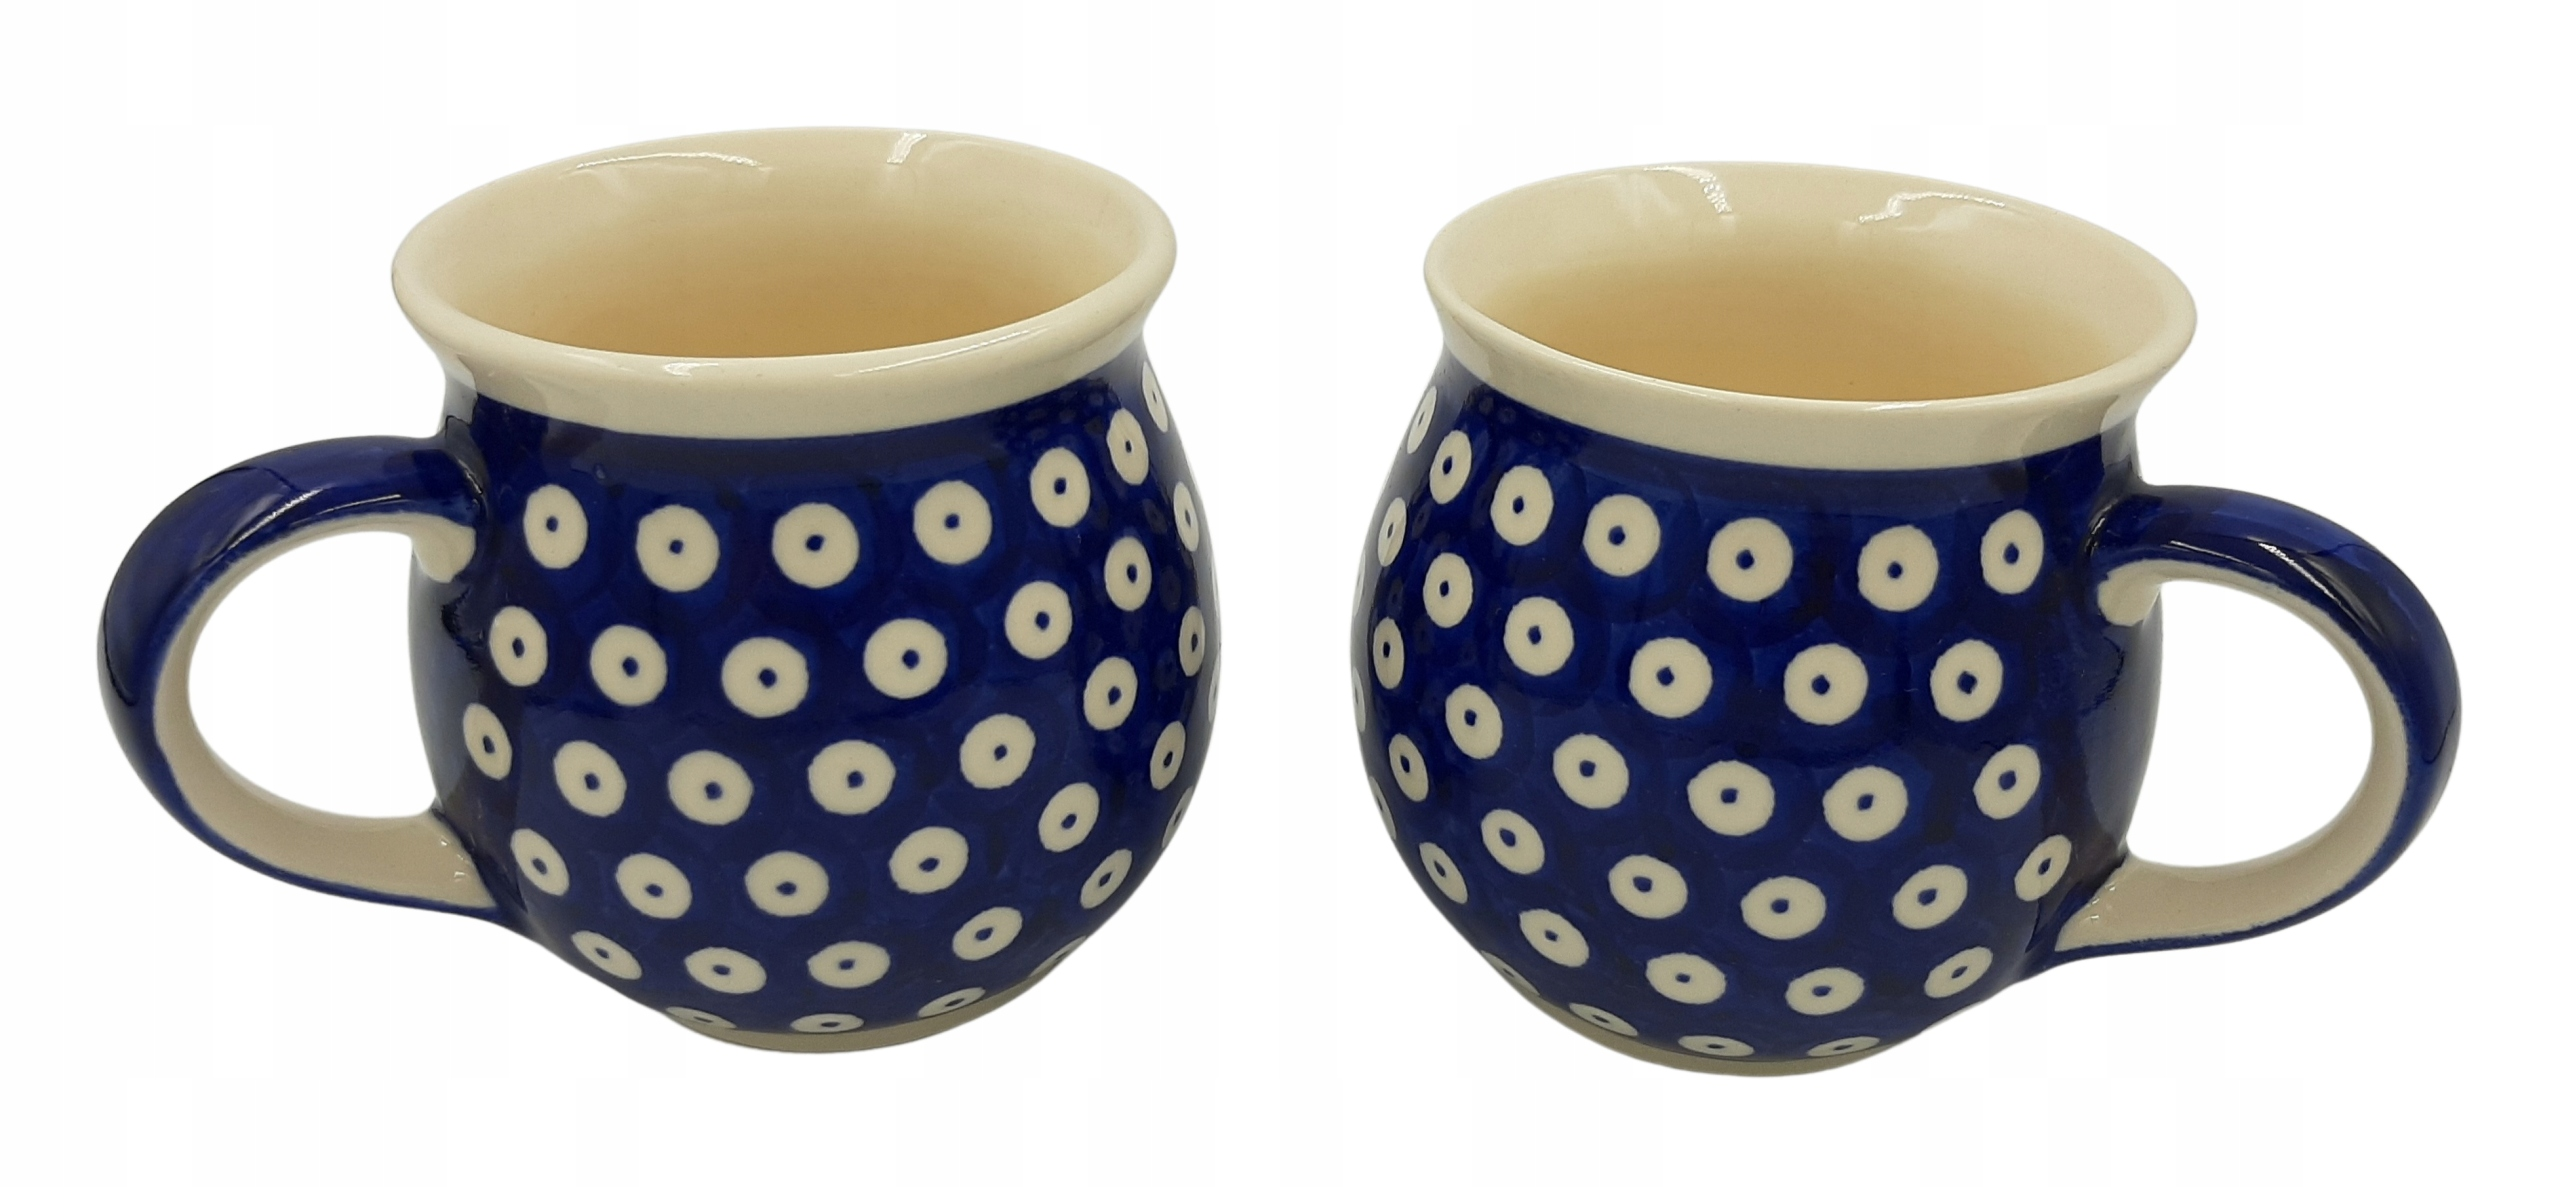 Ceramika Bolesławiec 2 стакана 300 мл